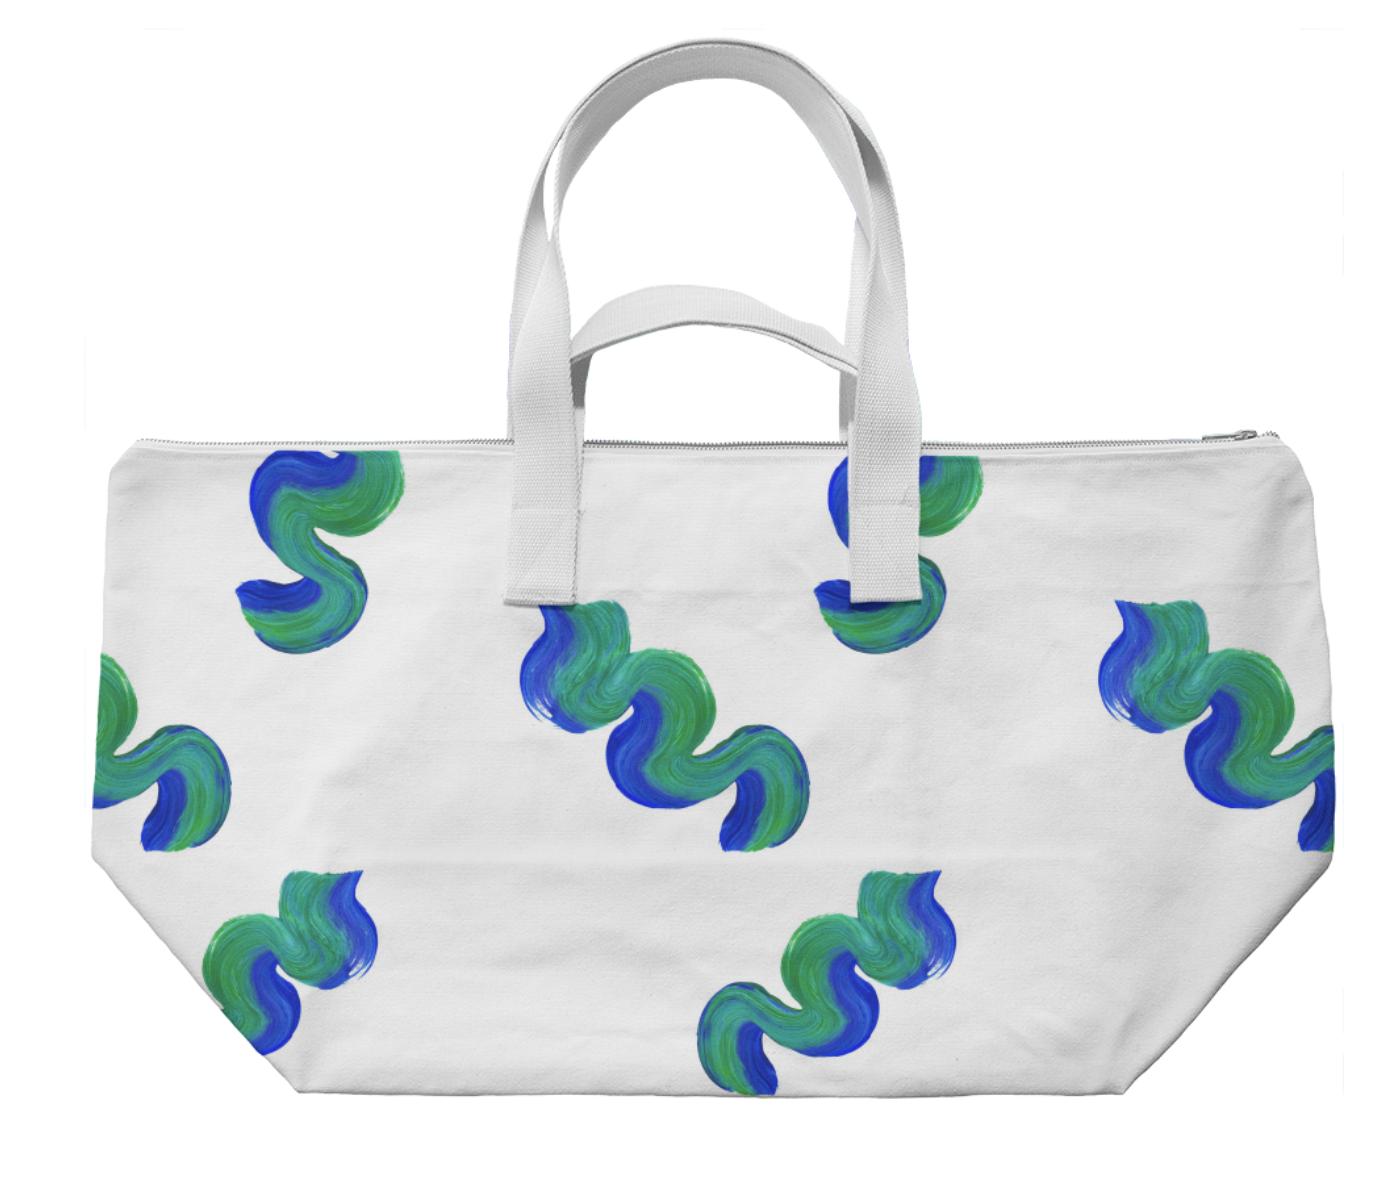 WAVY WEEKENDER II    Cotton Canvas Bag      Seventy Five Dollars